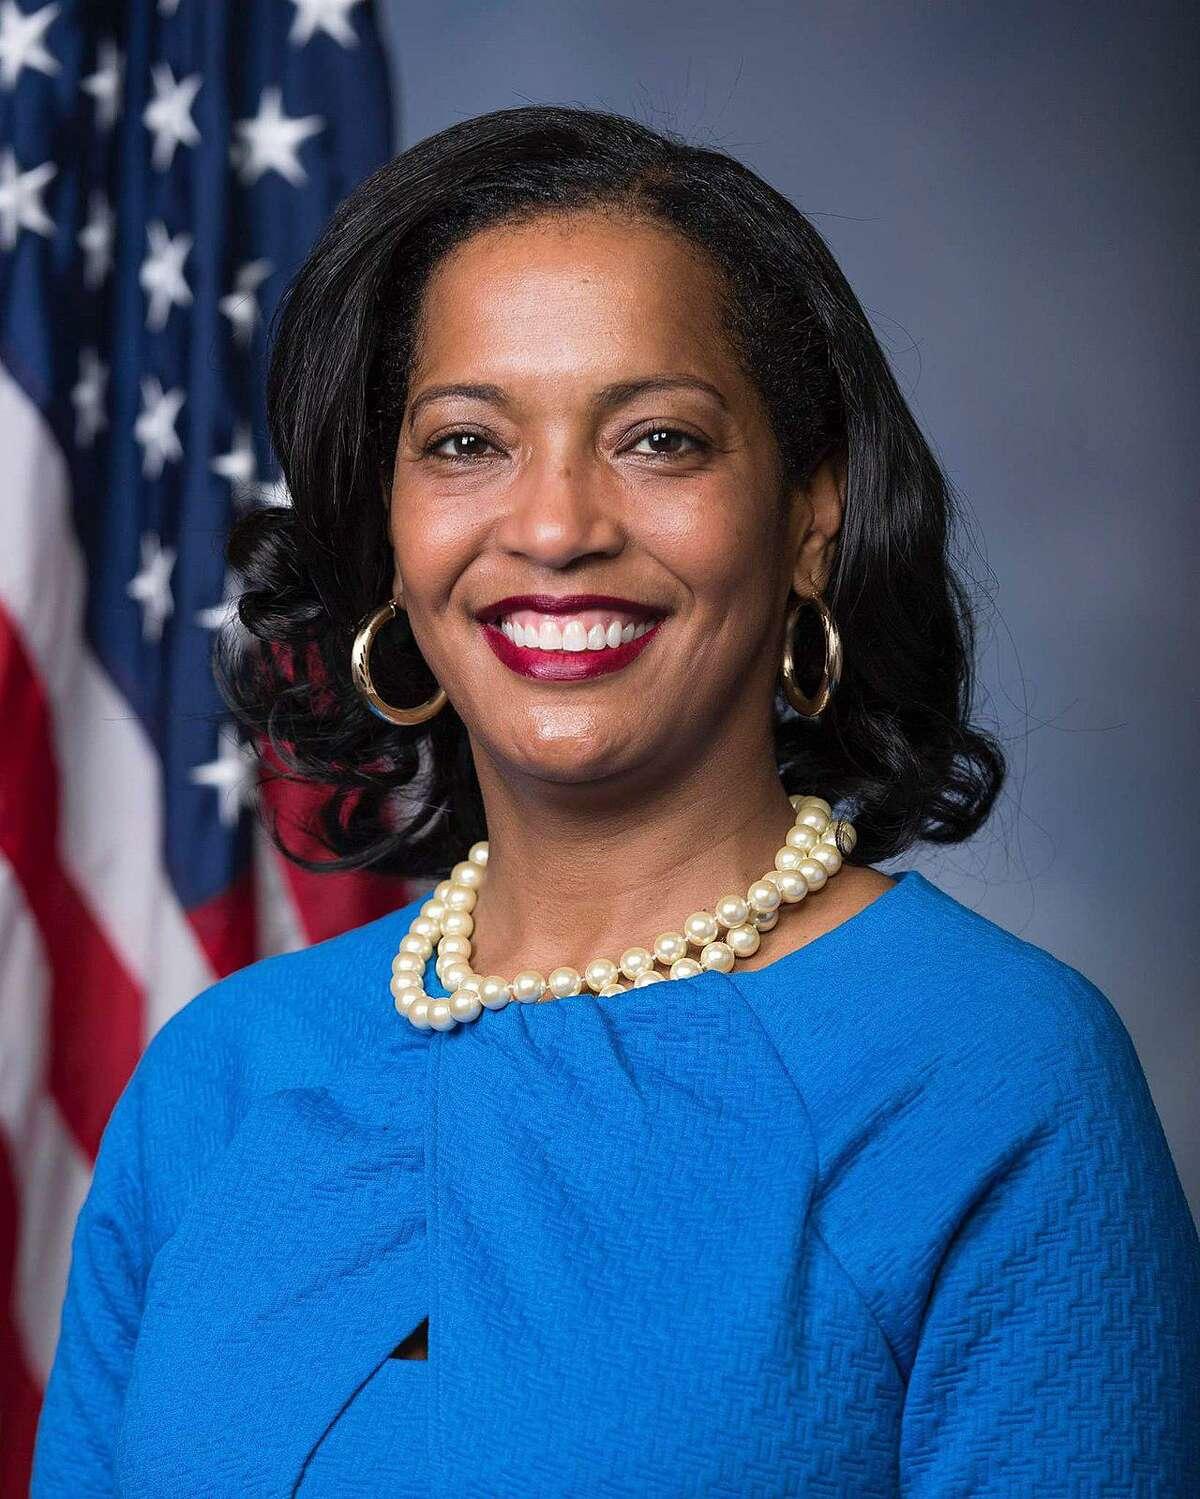 U.S. Rep. Jahana Hayes, a Democrat seeking a second term representing Connecticut's 5th Congressional District.